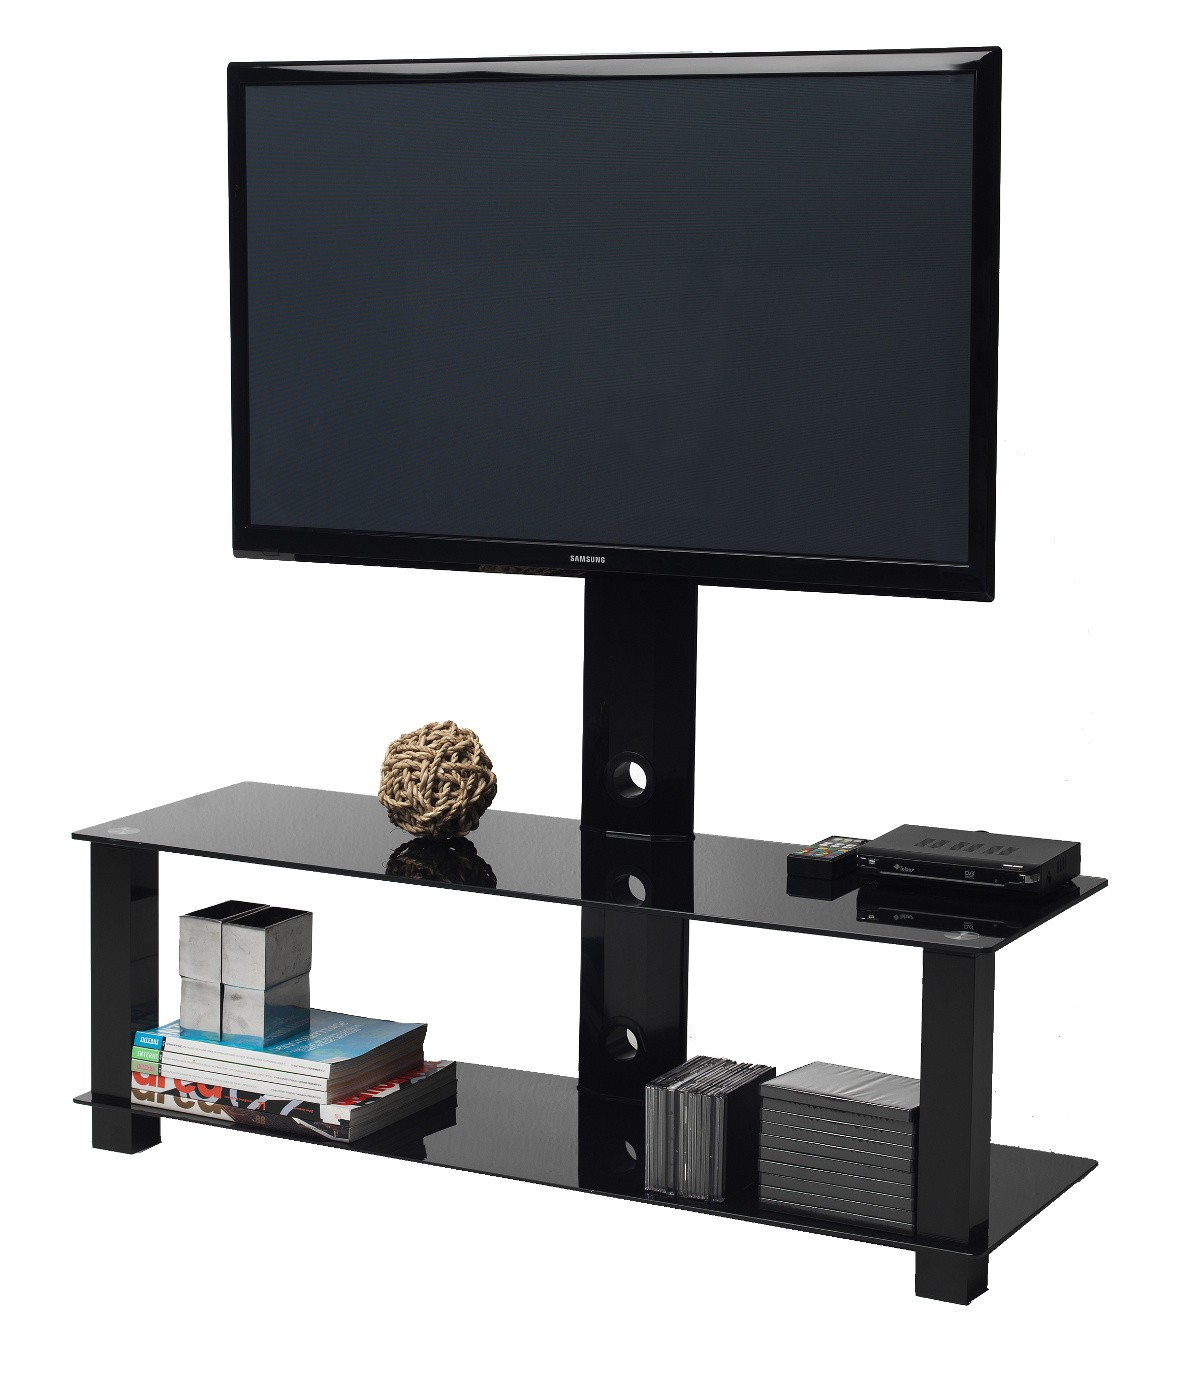 Mobili porta TV moderni: scopri le novità!